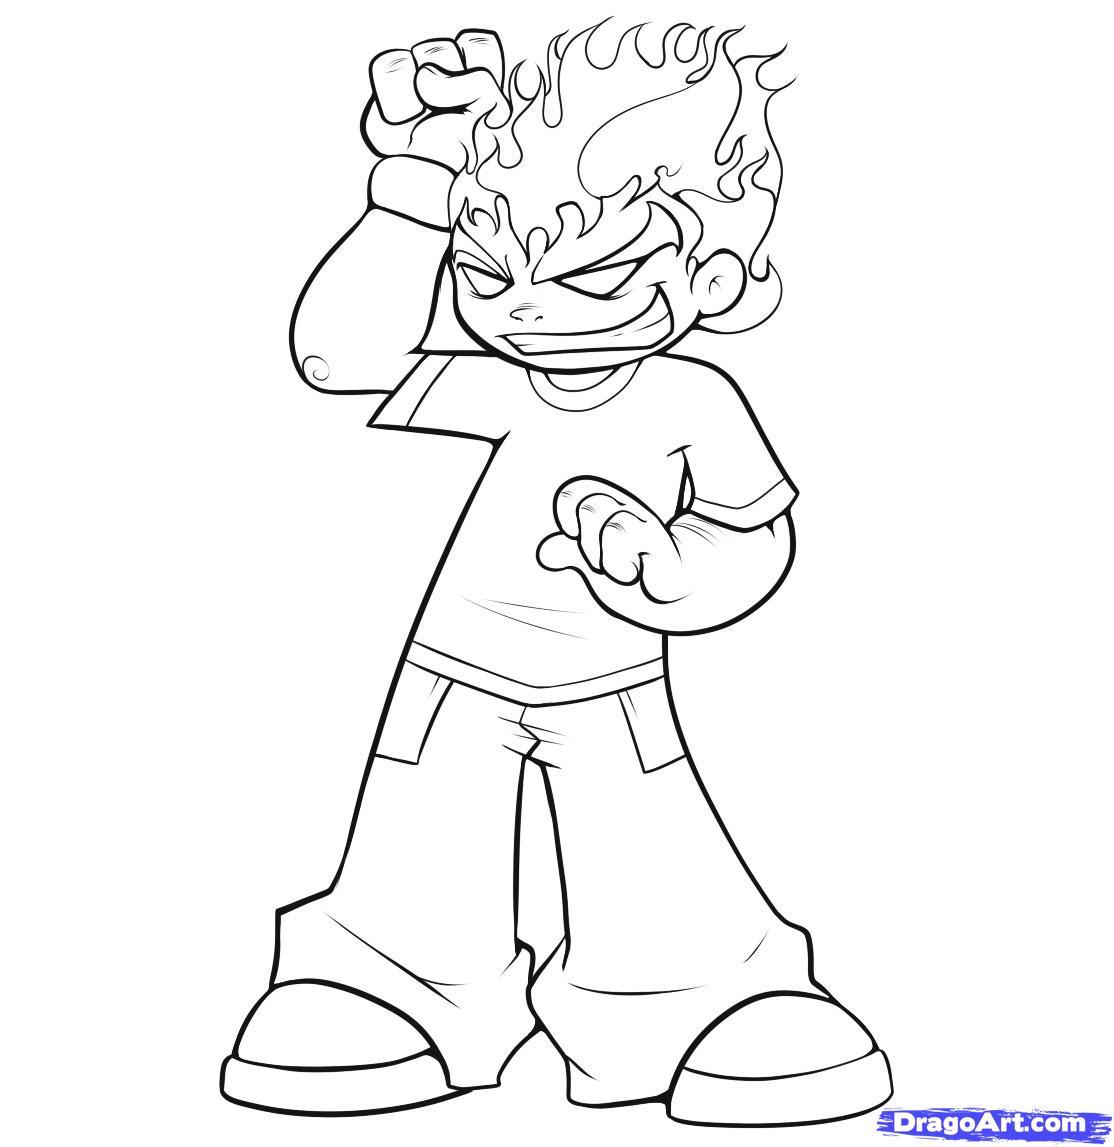 1114x1147 Drawings Of Cartoon Characters Easy Drawing Cartoon Characters